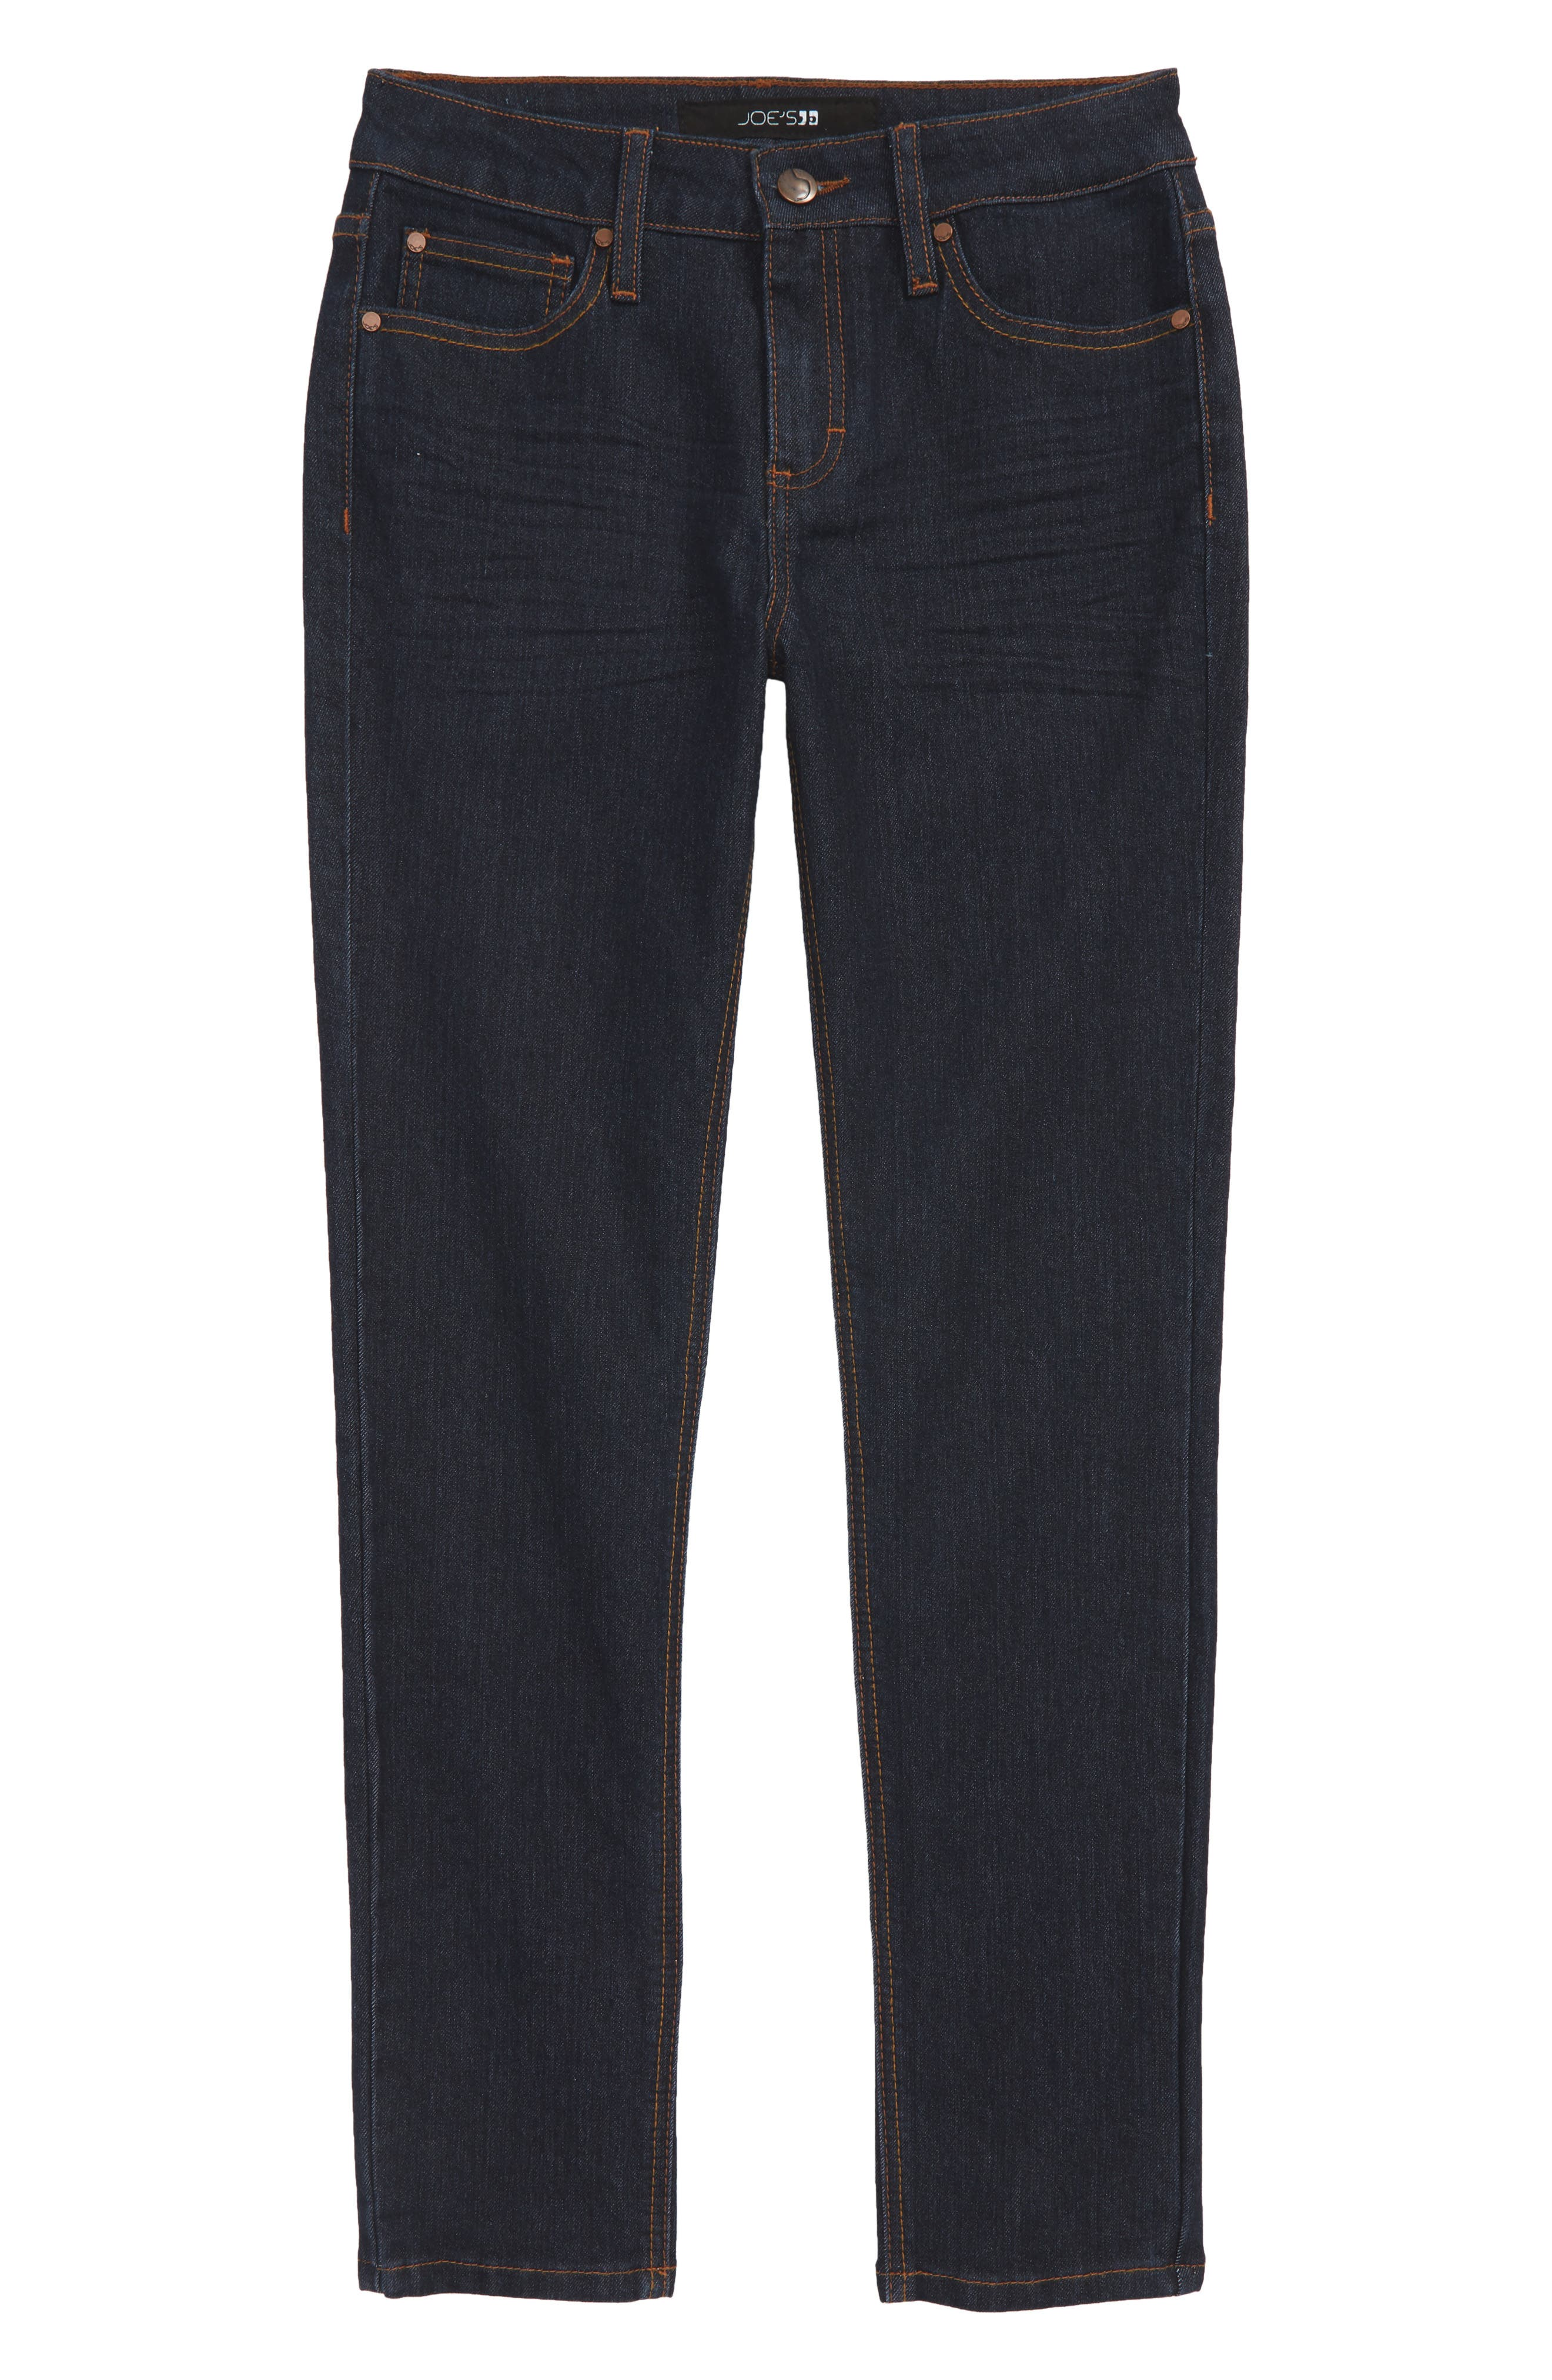 Brixton Straight Leg Stretch Jeans,                             Main thumbnail 1, color,                             RINSE